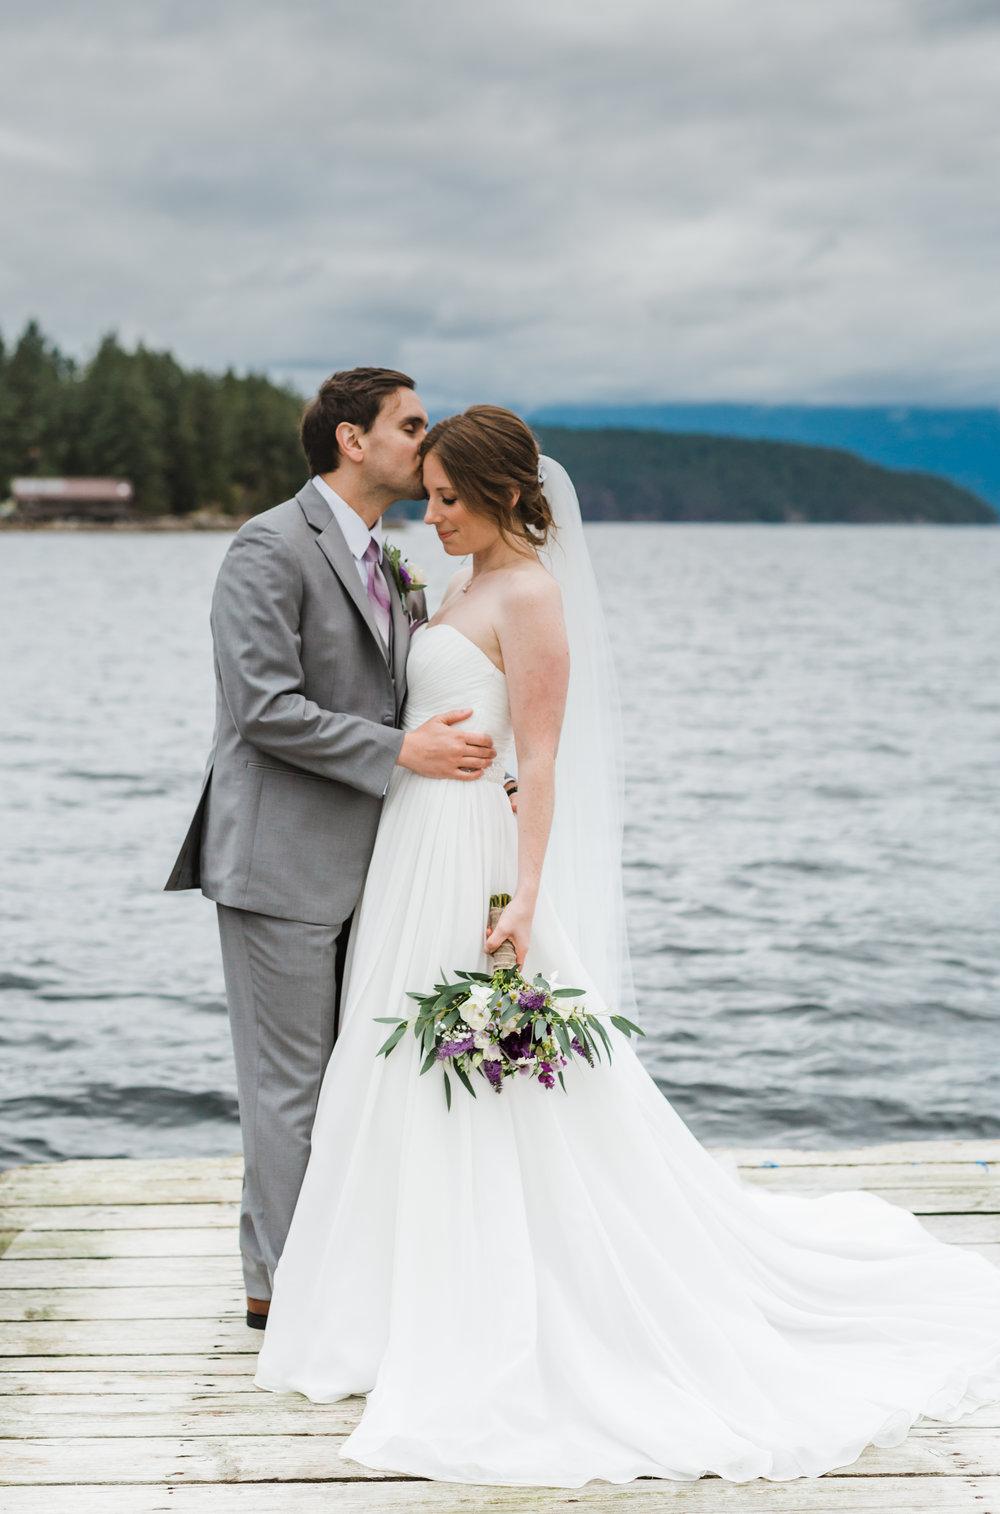 West Coast Wilderness Lodge Wedding Photos - Vancouver Wedding Photographer & Videographer - Sunshine Coast Wedding Photos - Sunshine Coast Wedding Photographer - Jennifer Picard Photography - IMG_6461.jpg